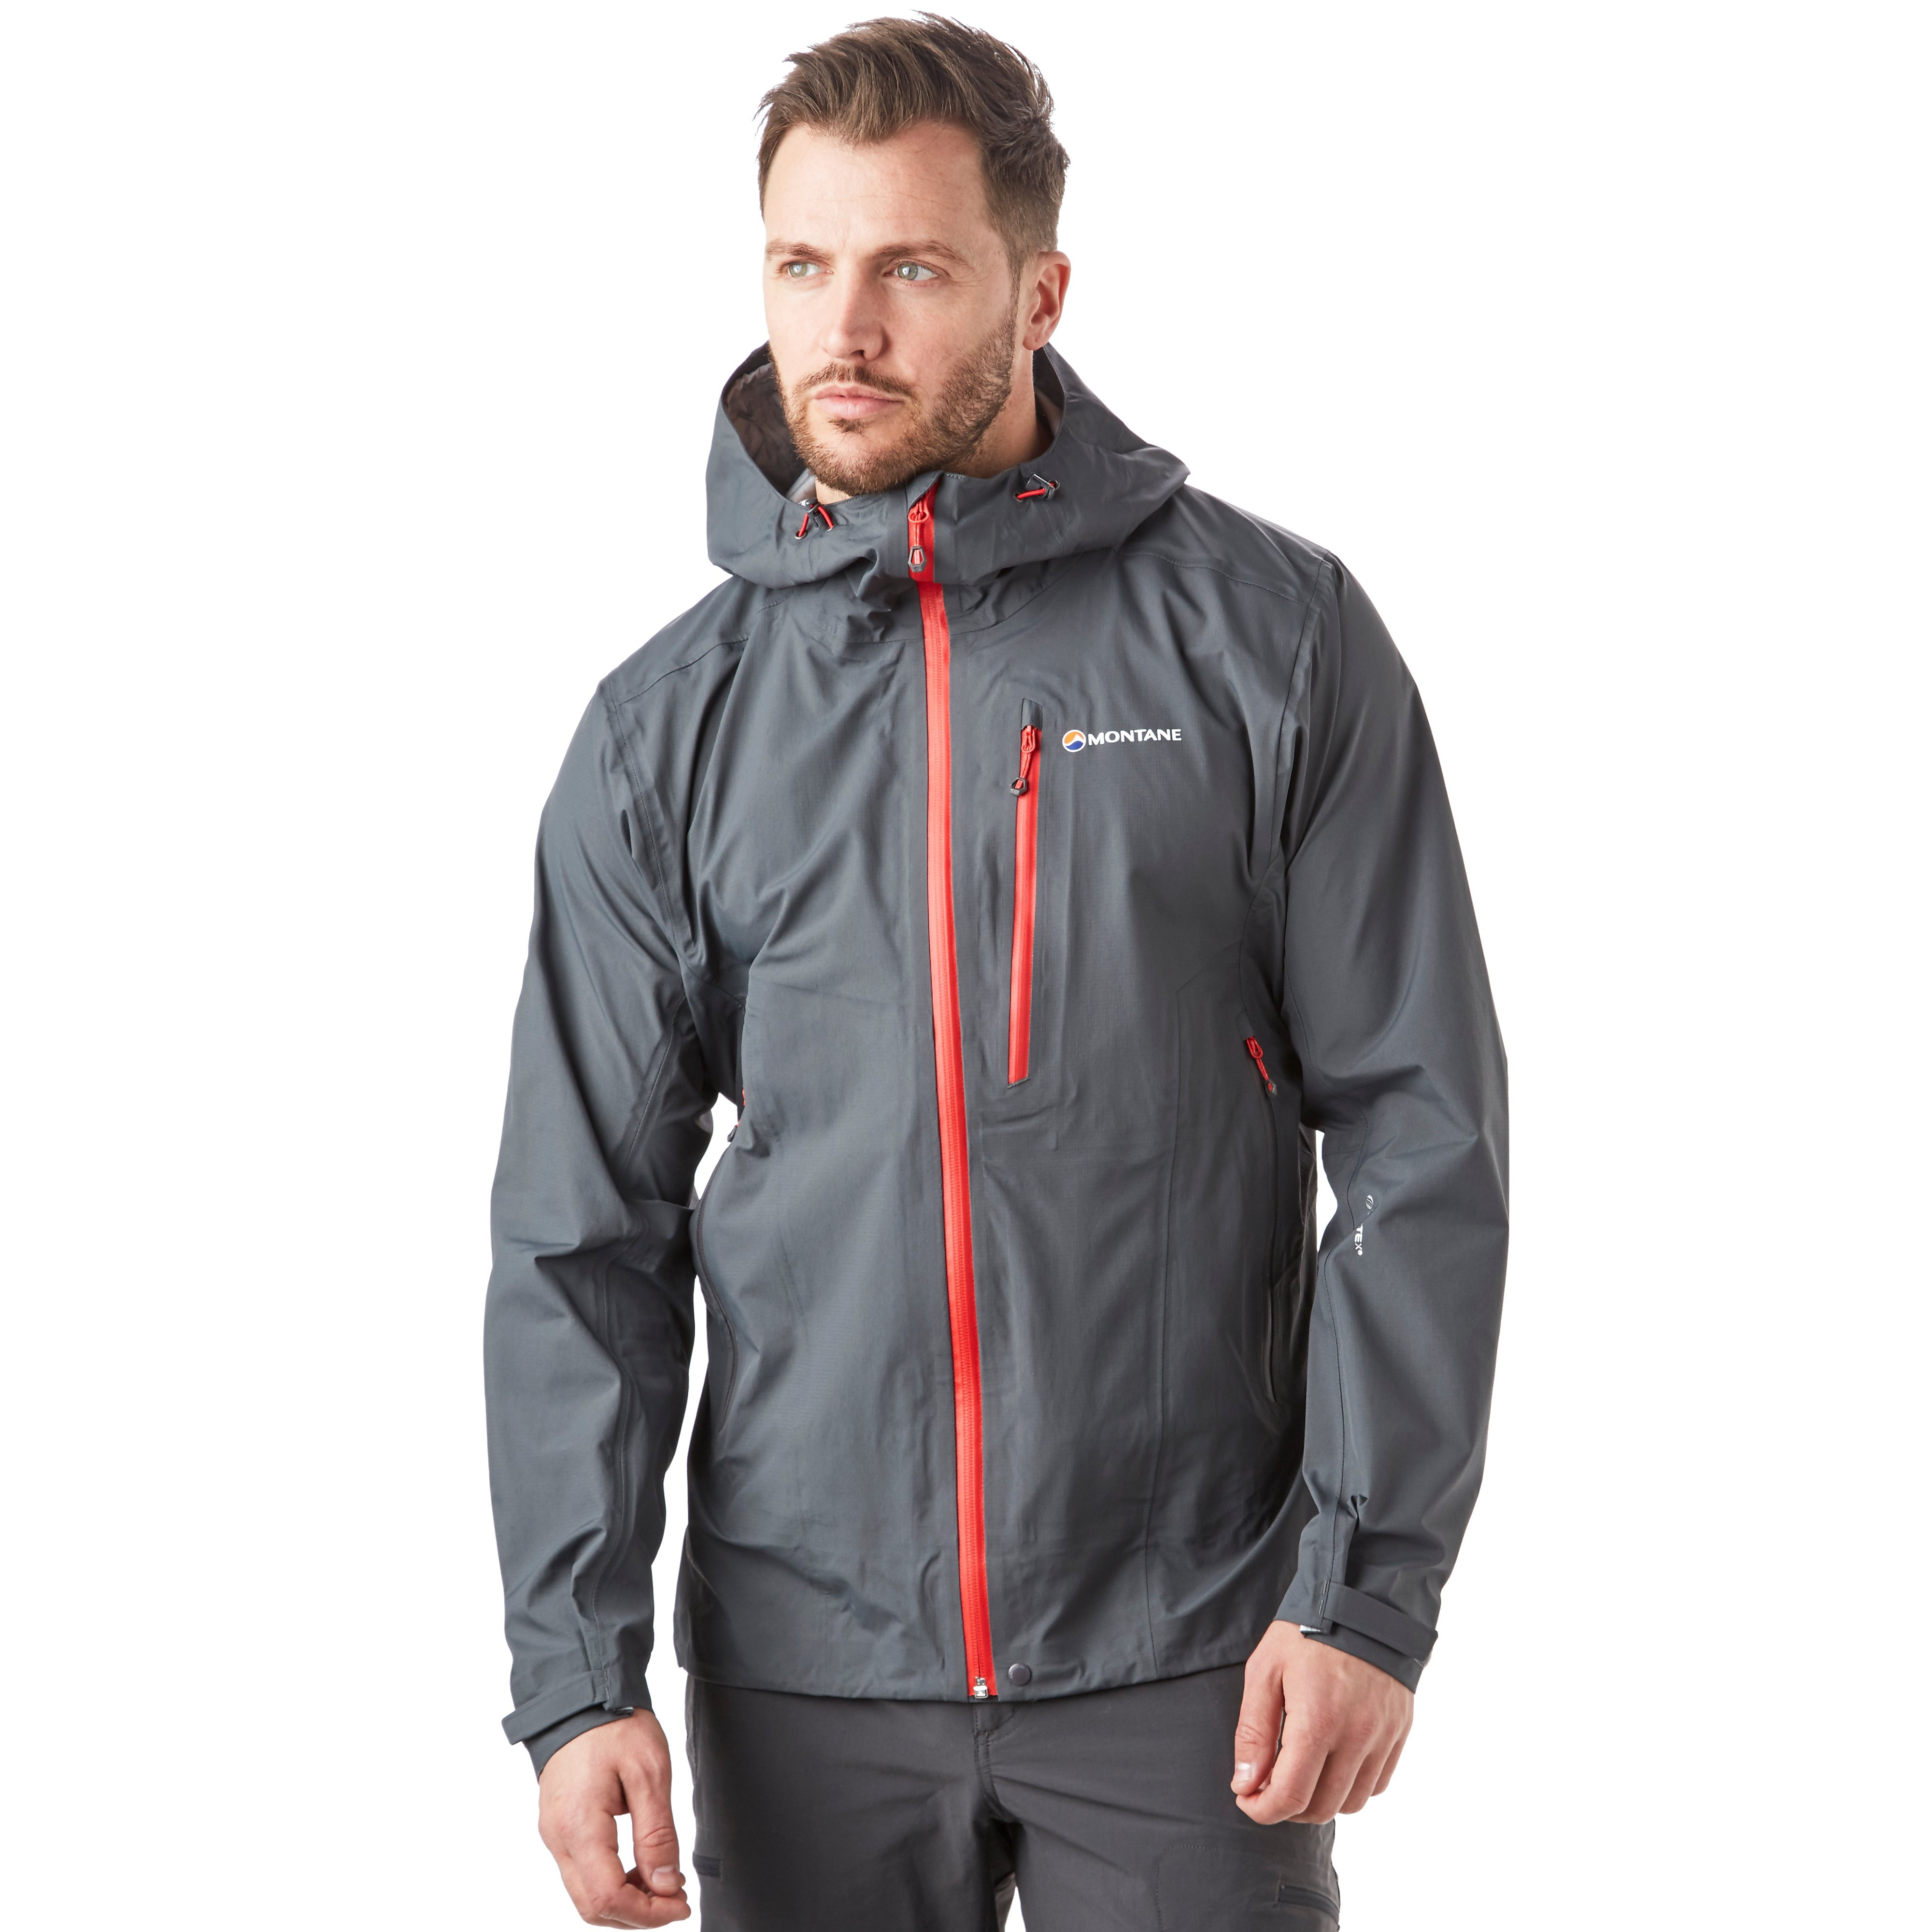 Montane Ultra Tour Men's Jacket